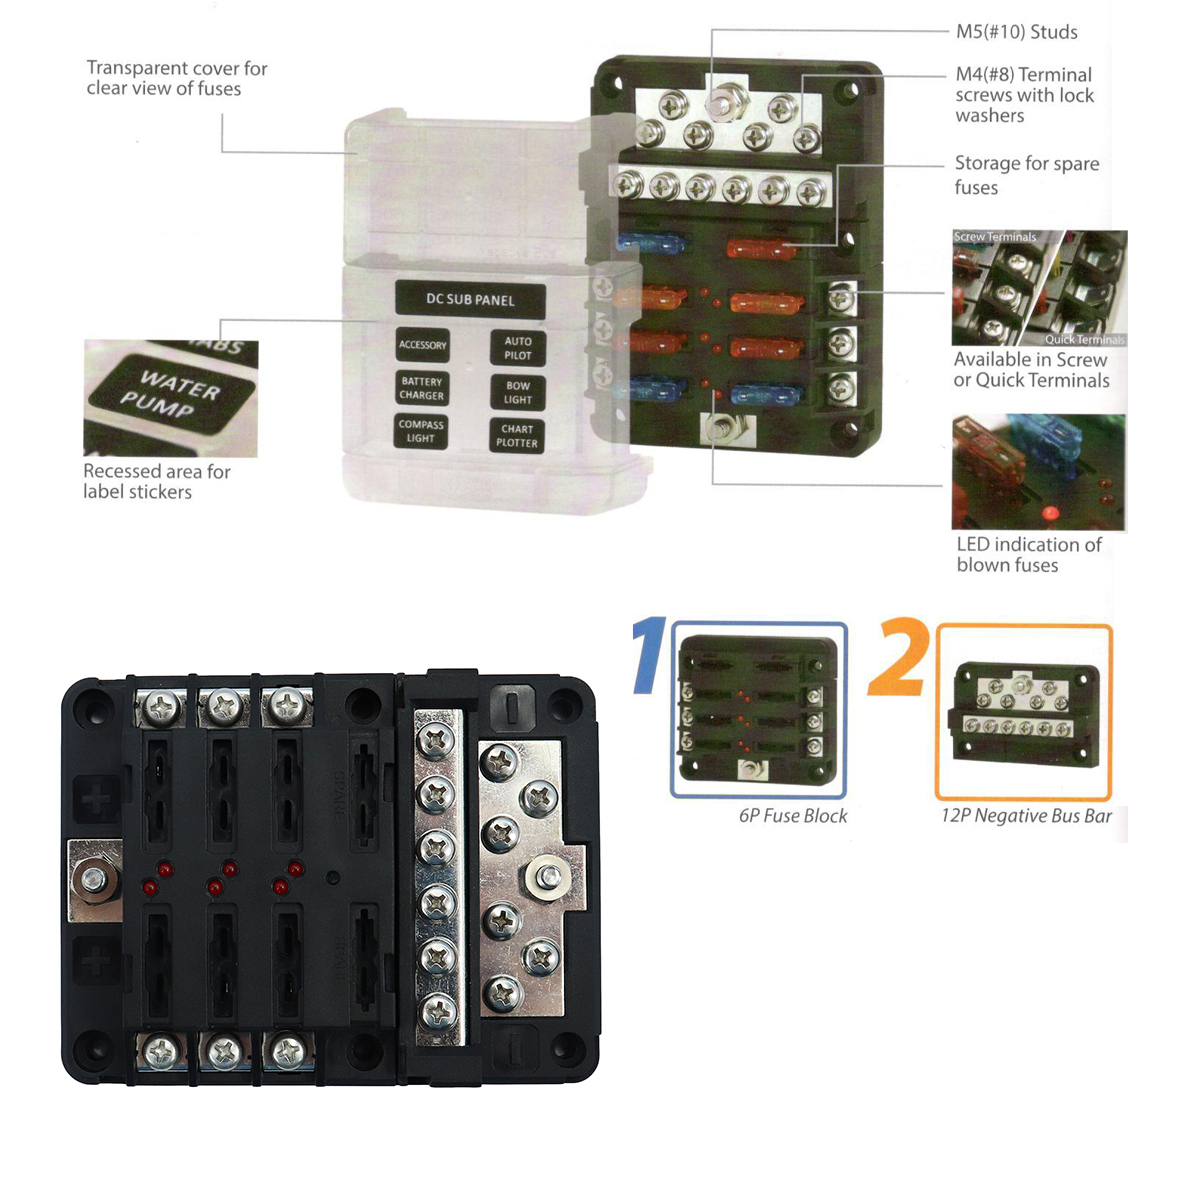 medium resolution of f3618 dc fuse box with lamp 12 bit negative common box modular fl70 fuse holder diagram